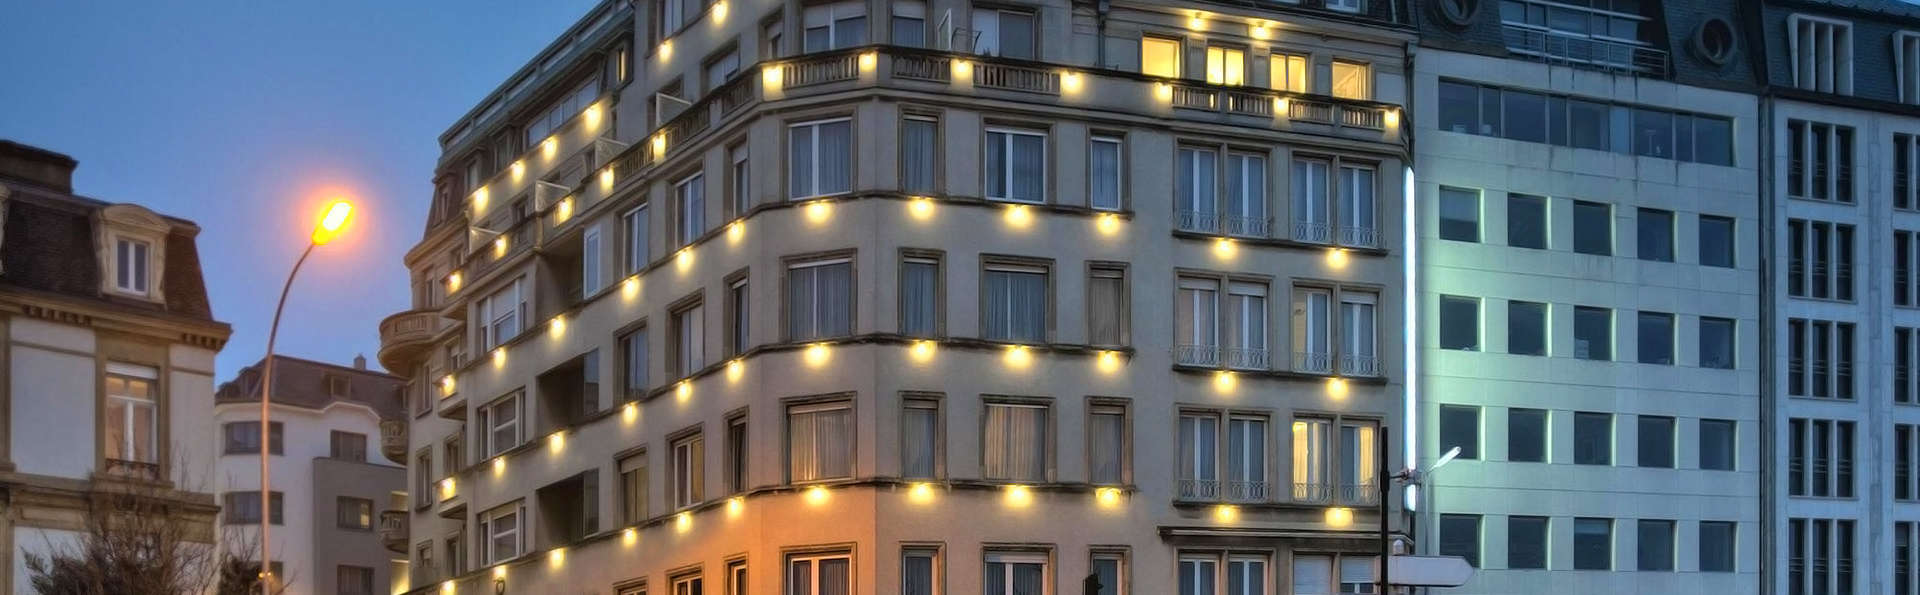 Grand Hotel Cravat - EDIT_Exterior.jpg